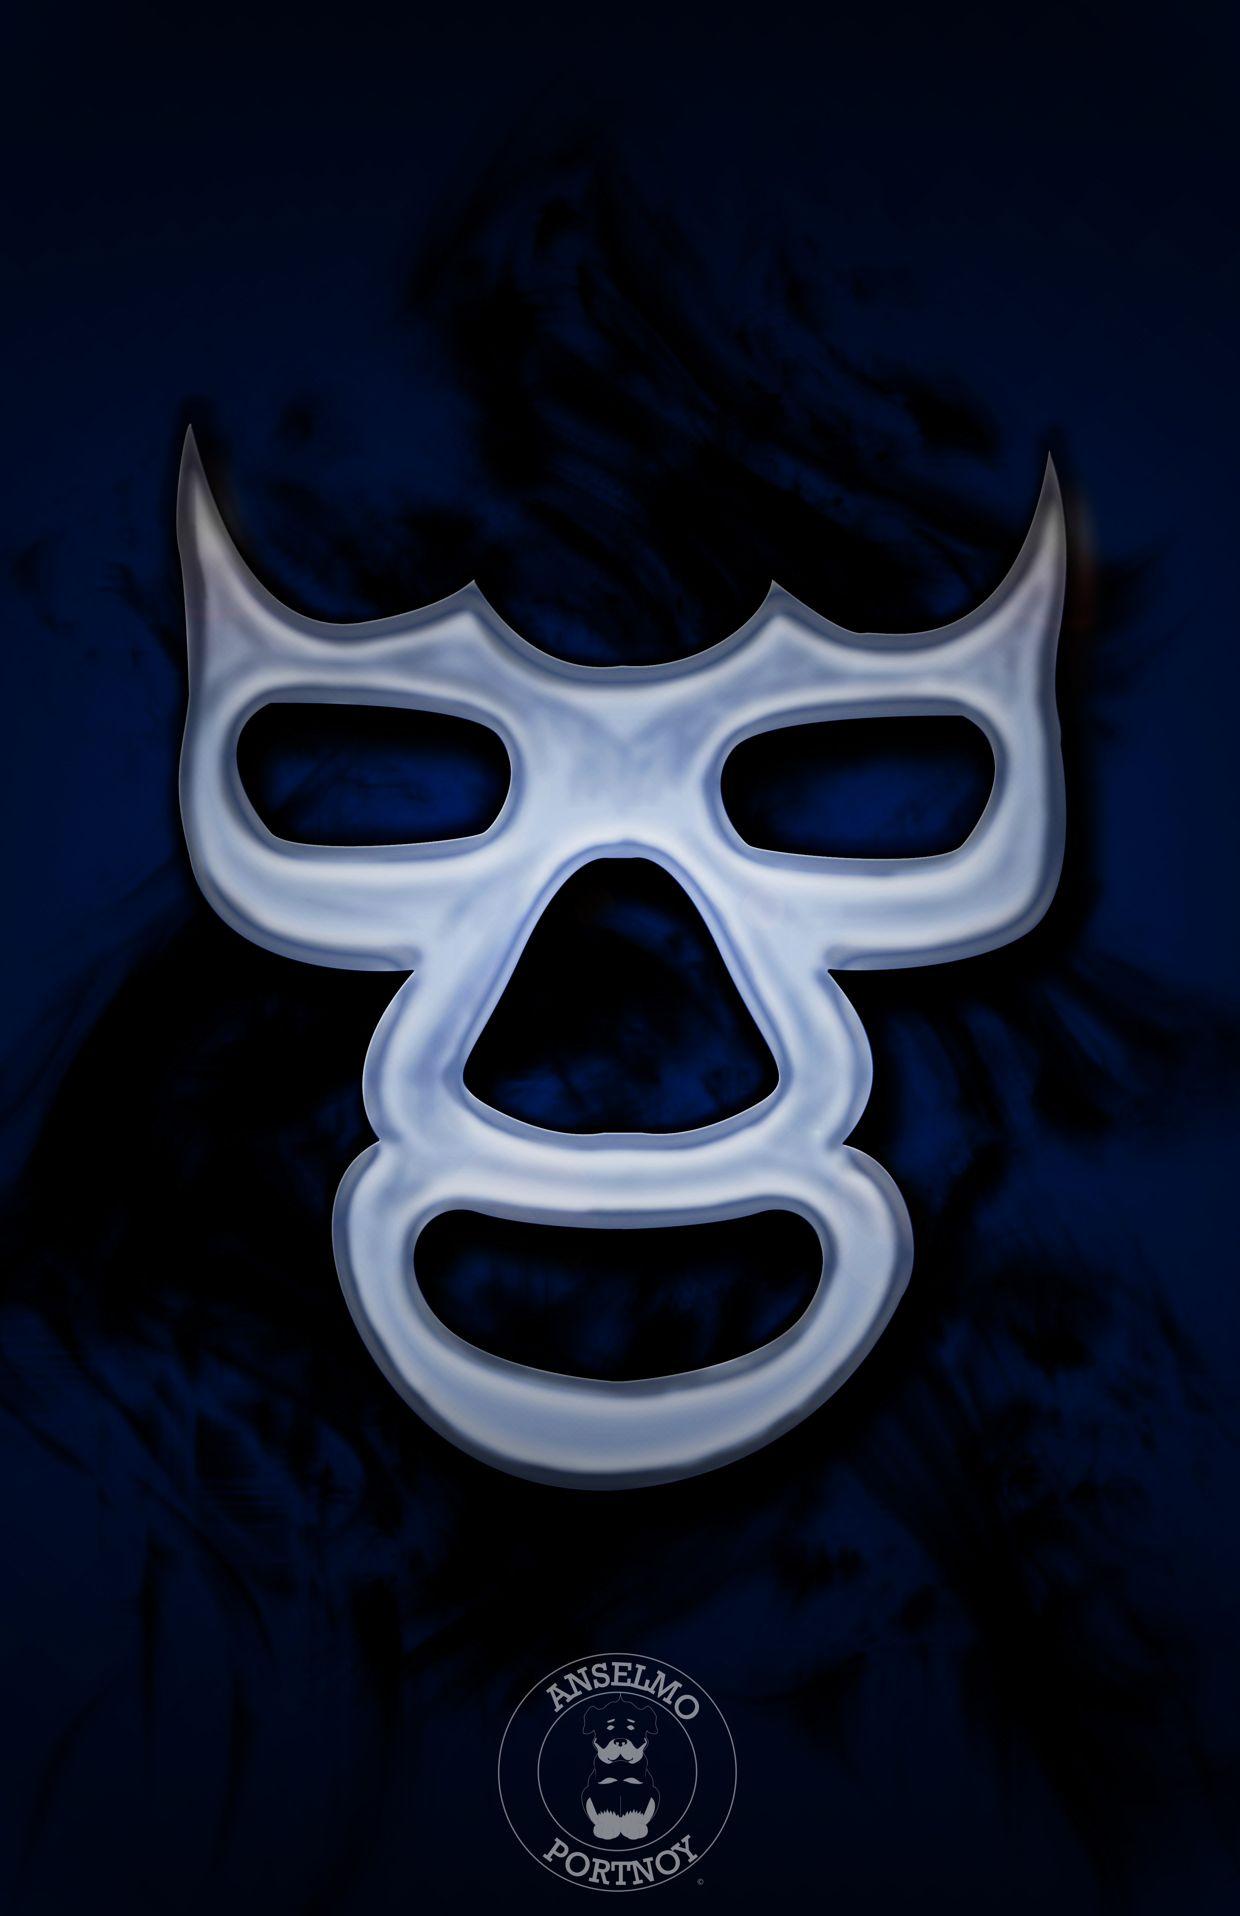 Blue Demondhttps Www Bauhaus Hr Kupaonski Ormaric Madera 59x172 8x33 Cm Html Carteles De Lucha Libre Mascaras Lucha Libre Imagenes De Lucha Libre